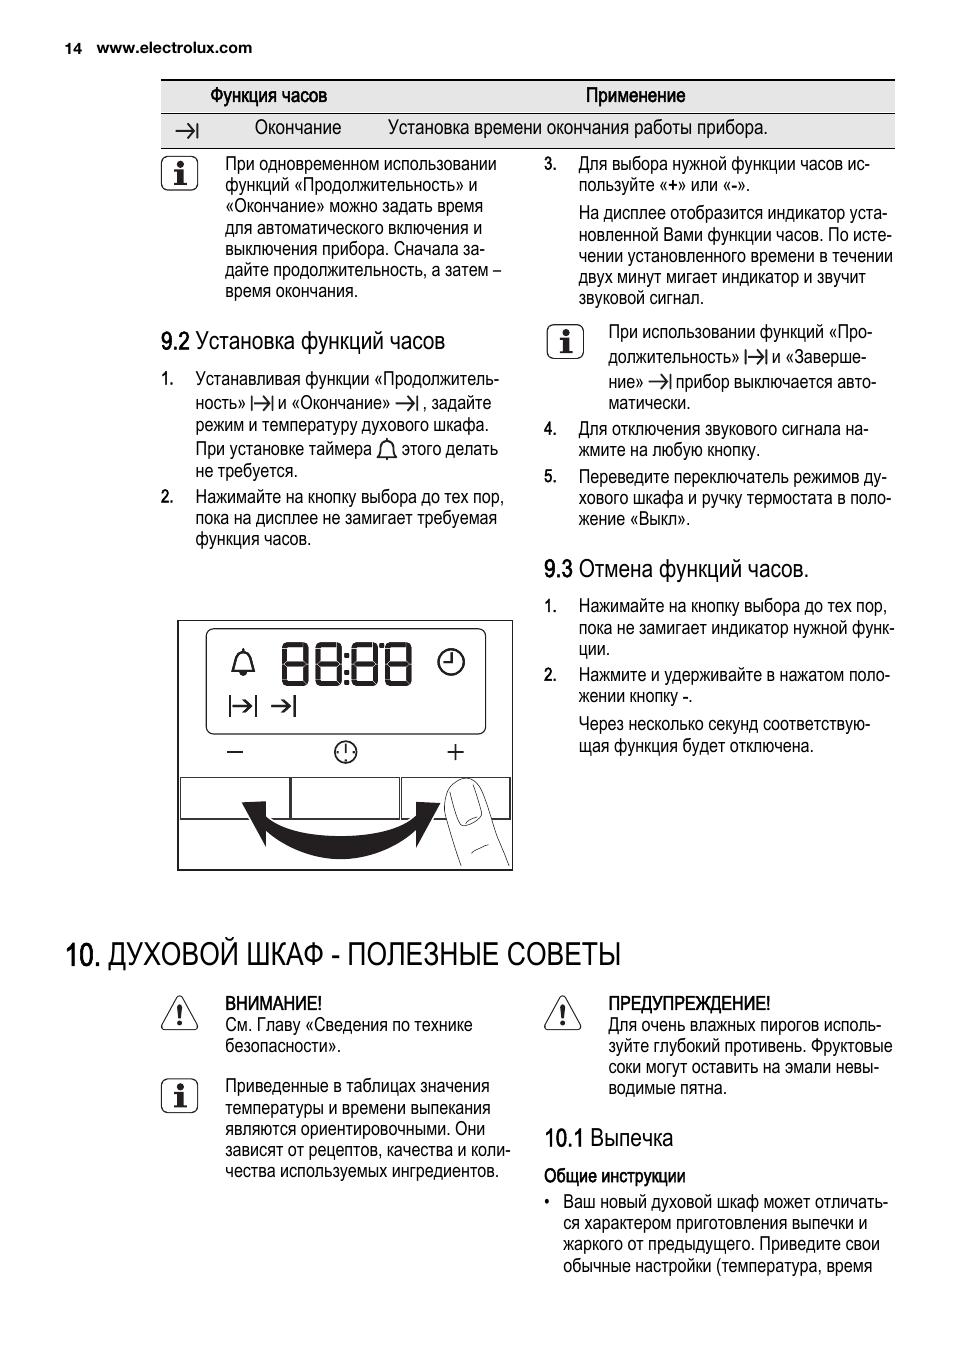 как перевести часы на плите электролюкс Барнауле живодеры